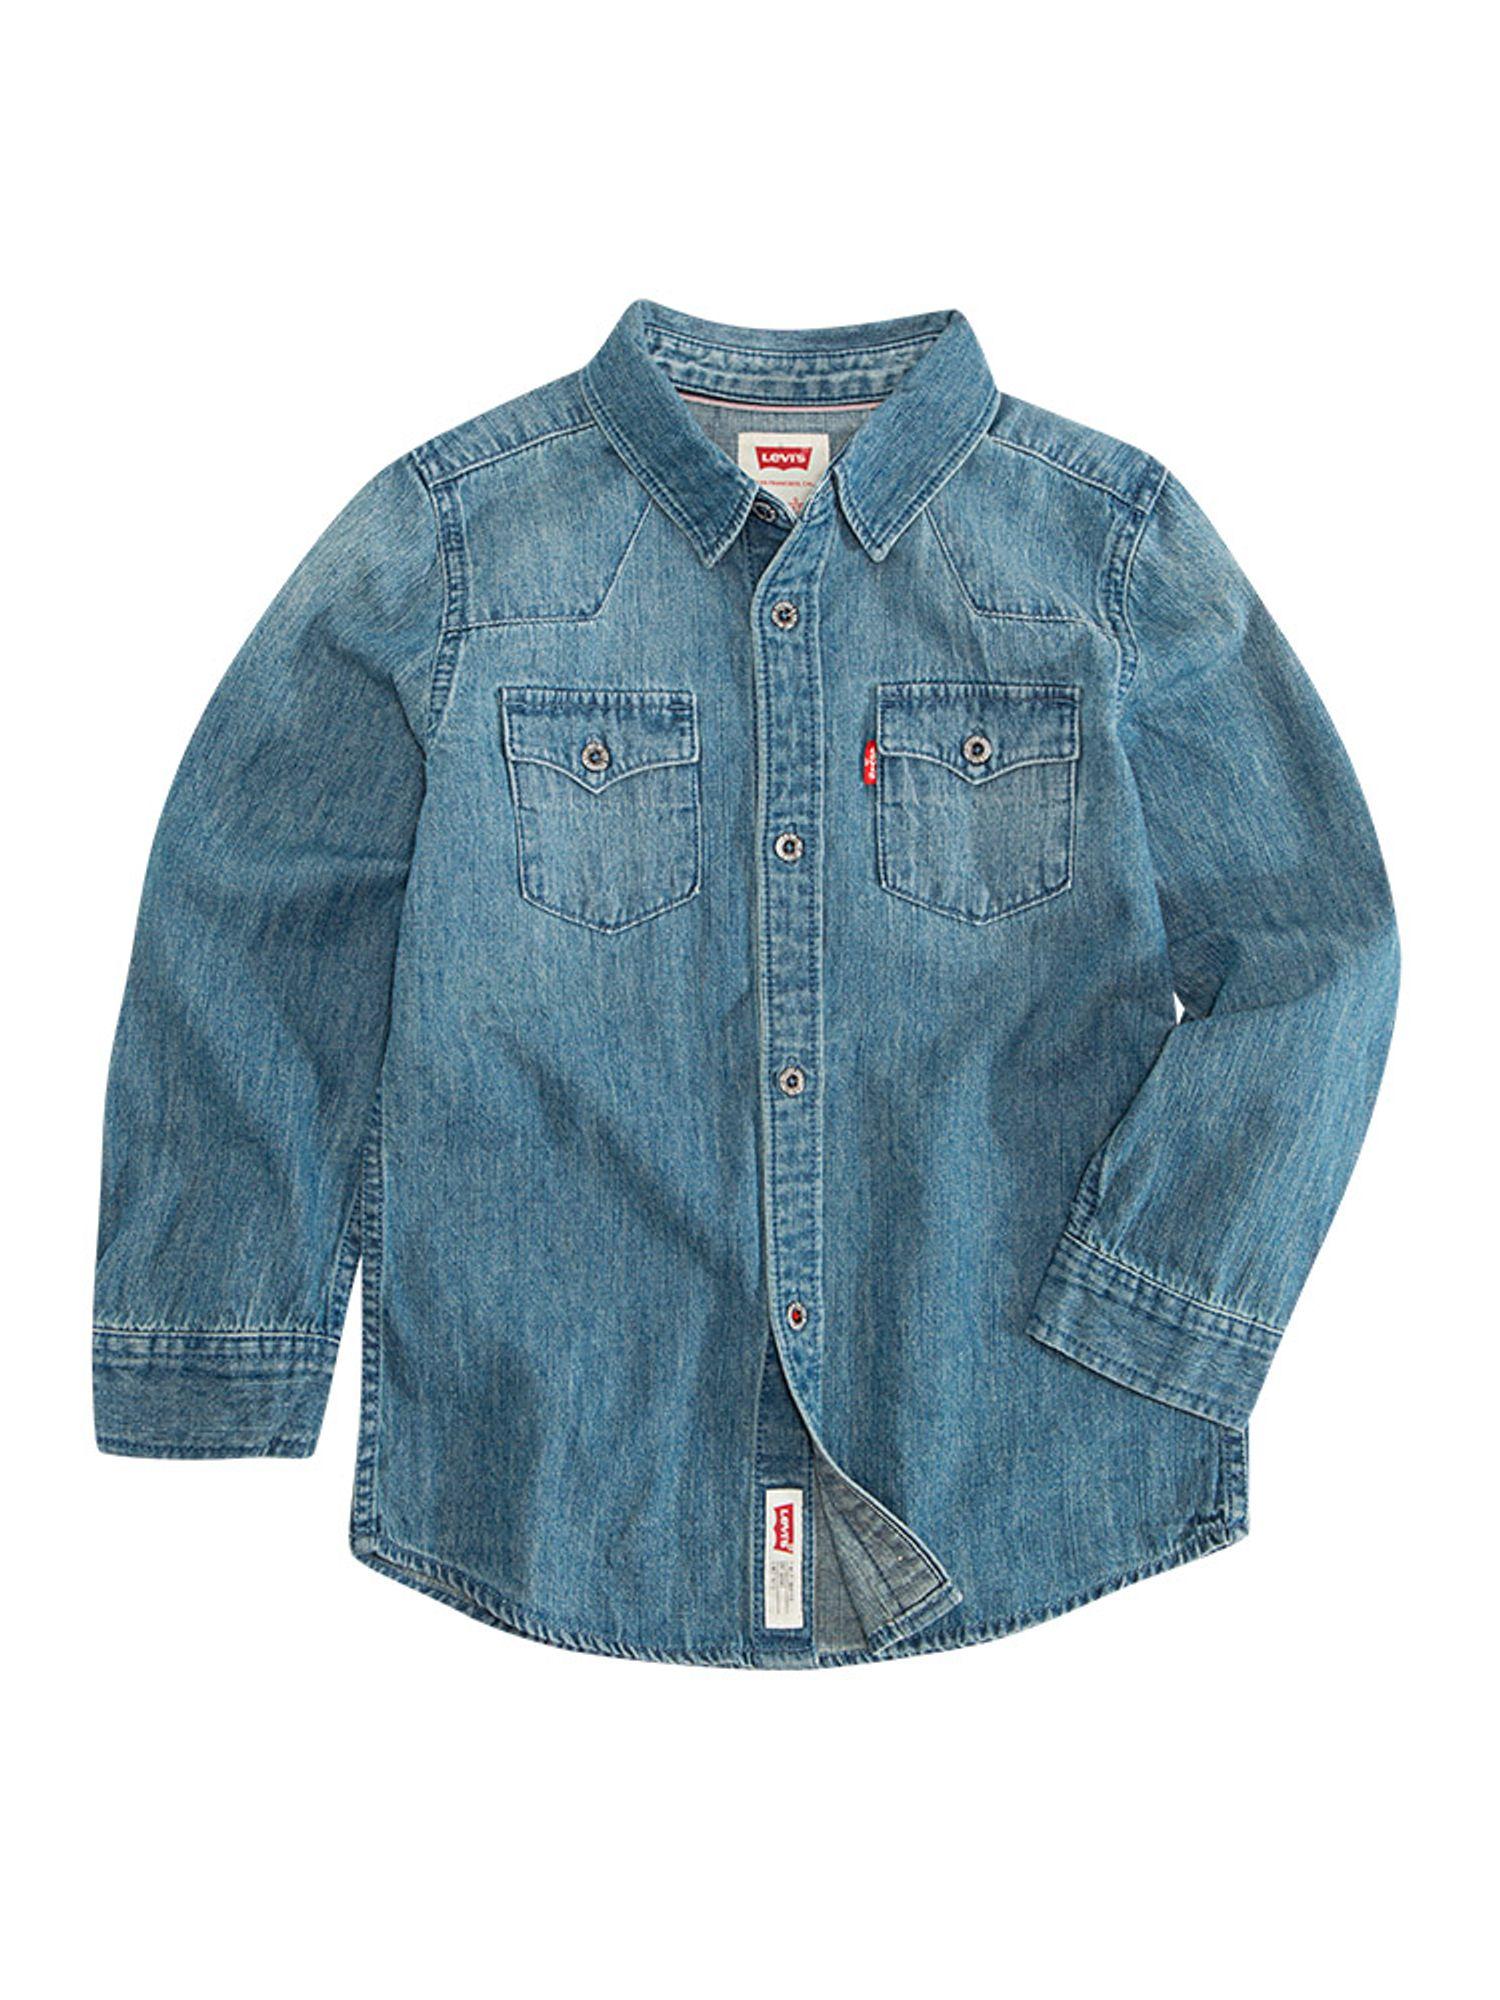 Camisa_Classic_Western_Denim_Vintage_Stone_-8-16_años-_1